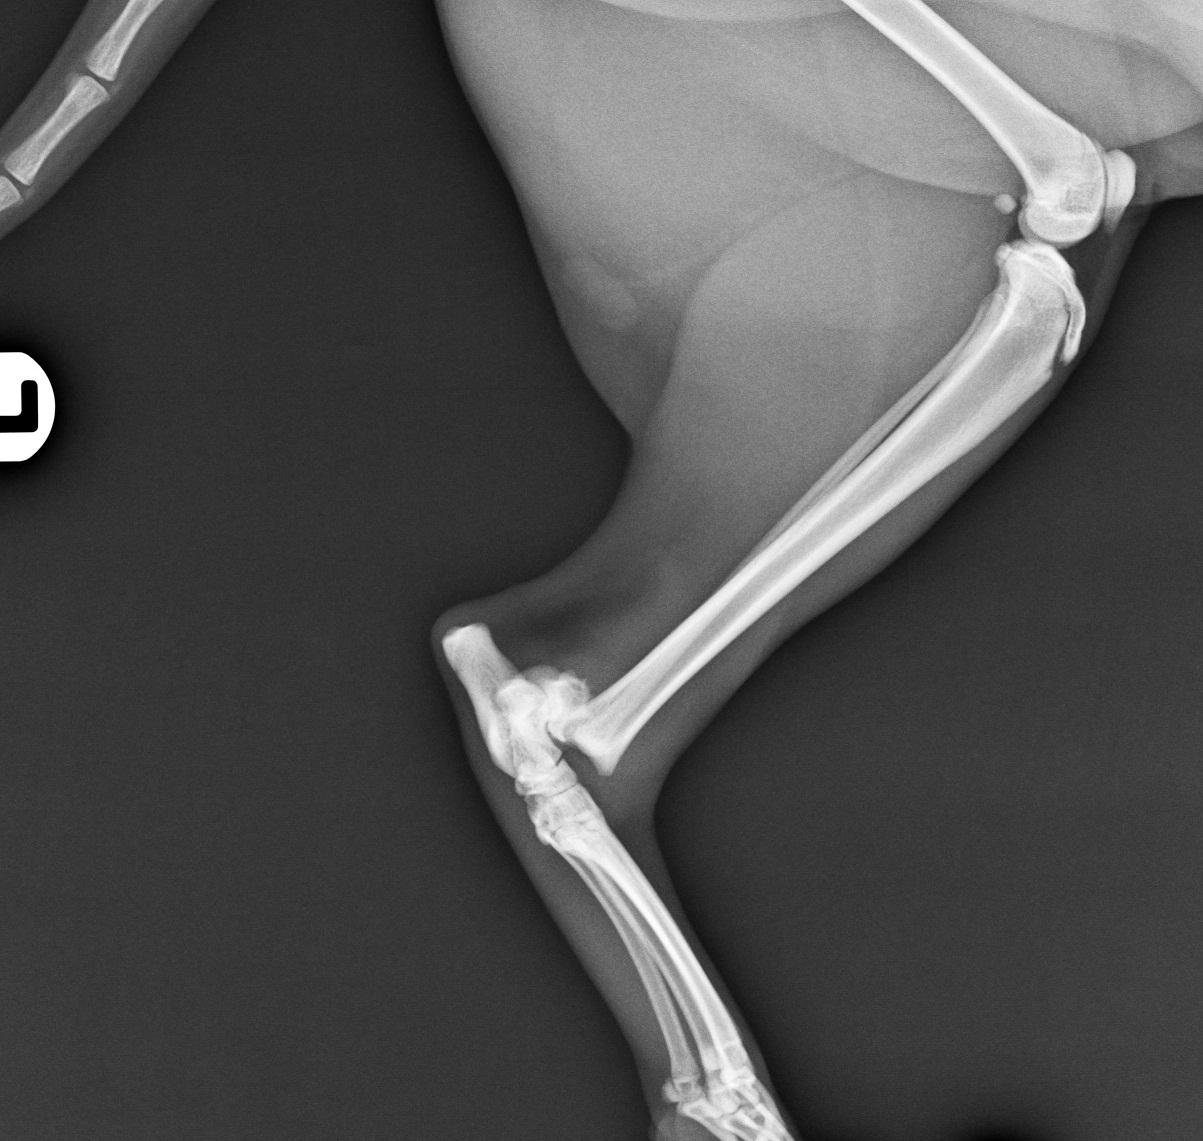 SOLVET fractua distal tibia